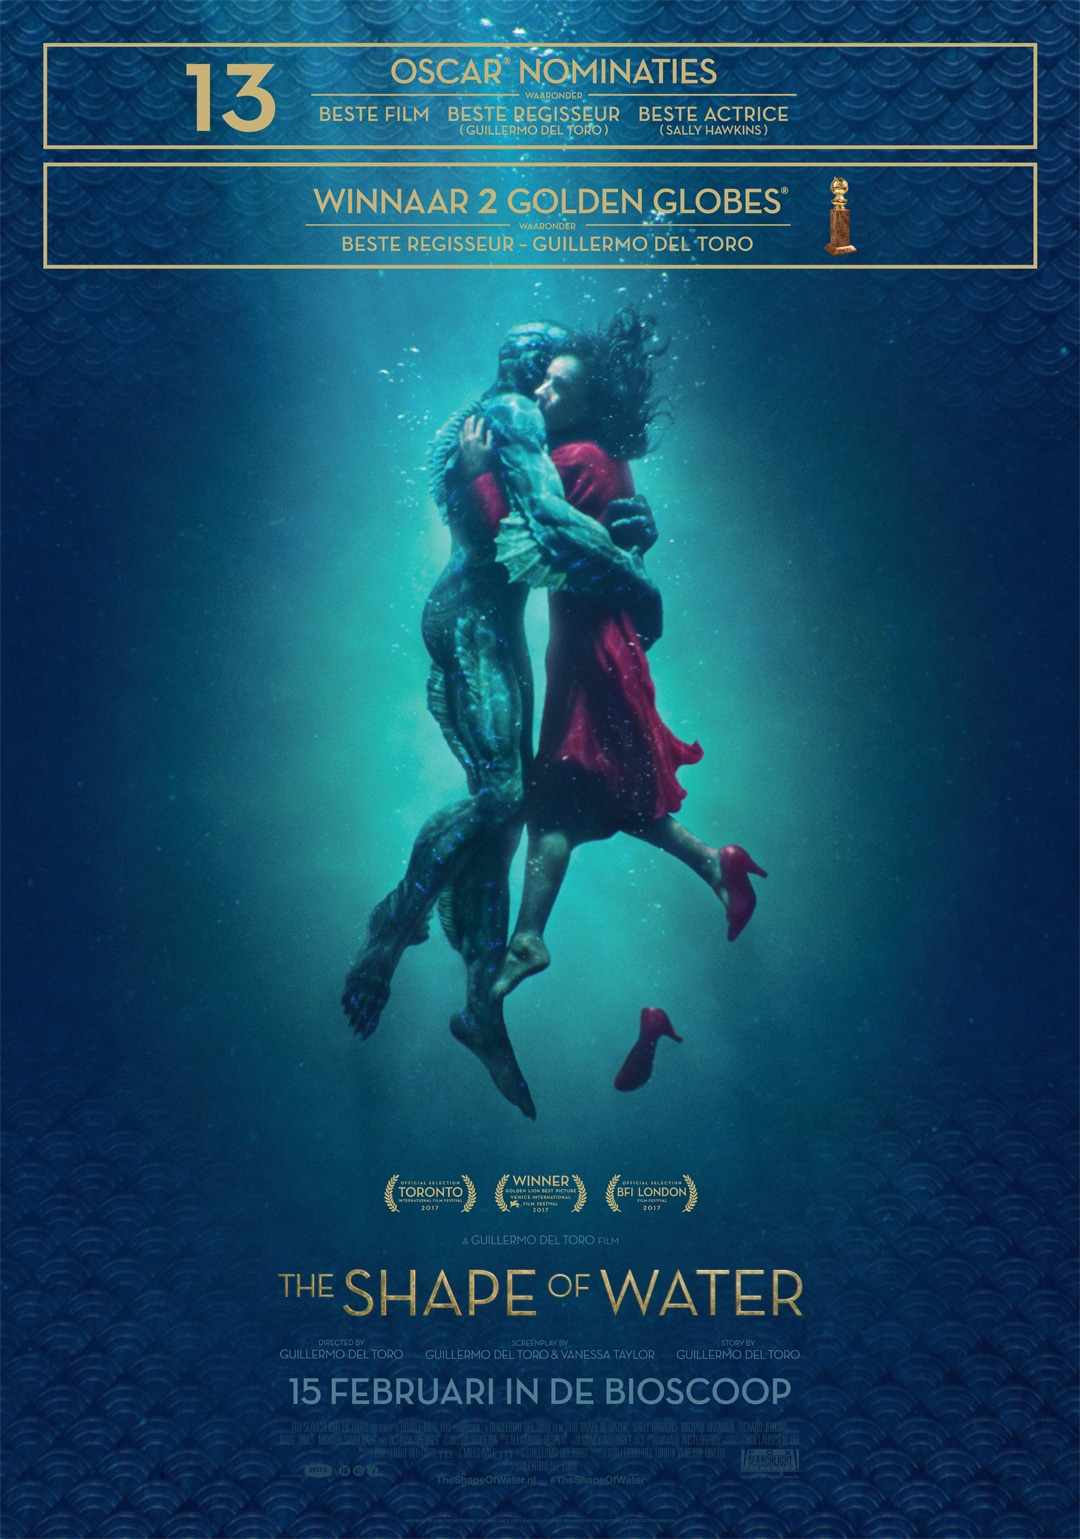 Topfilm The shape of water en andere 'must see movies' deze voorjaarsvakantie.